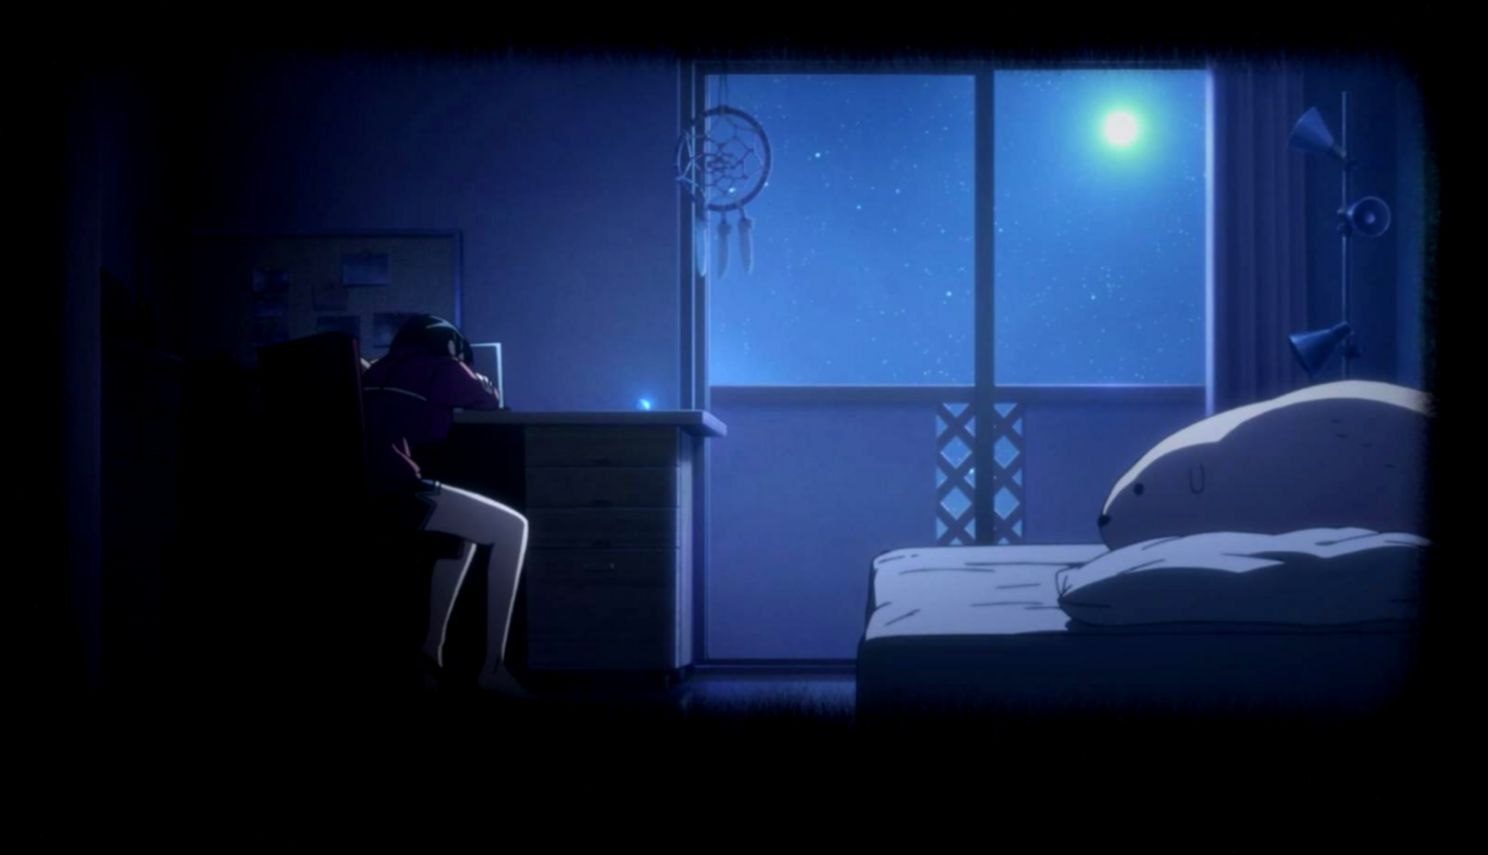 Anime Girl In Bed Room